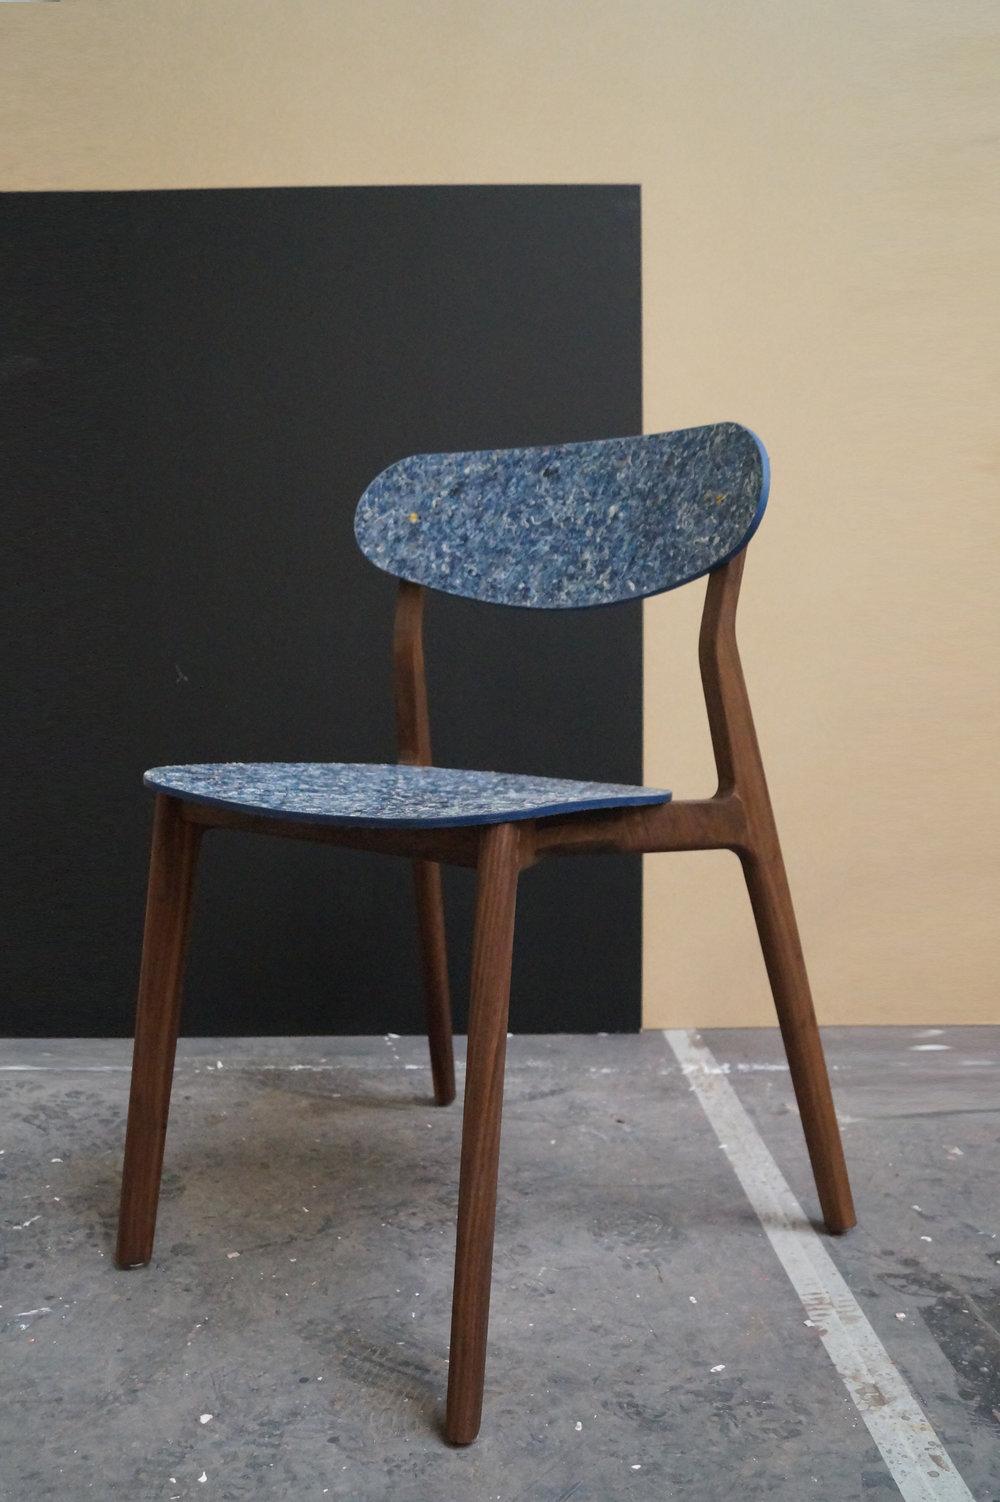 Ubu_Chair_Iso_02.jpg